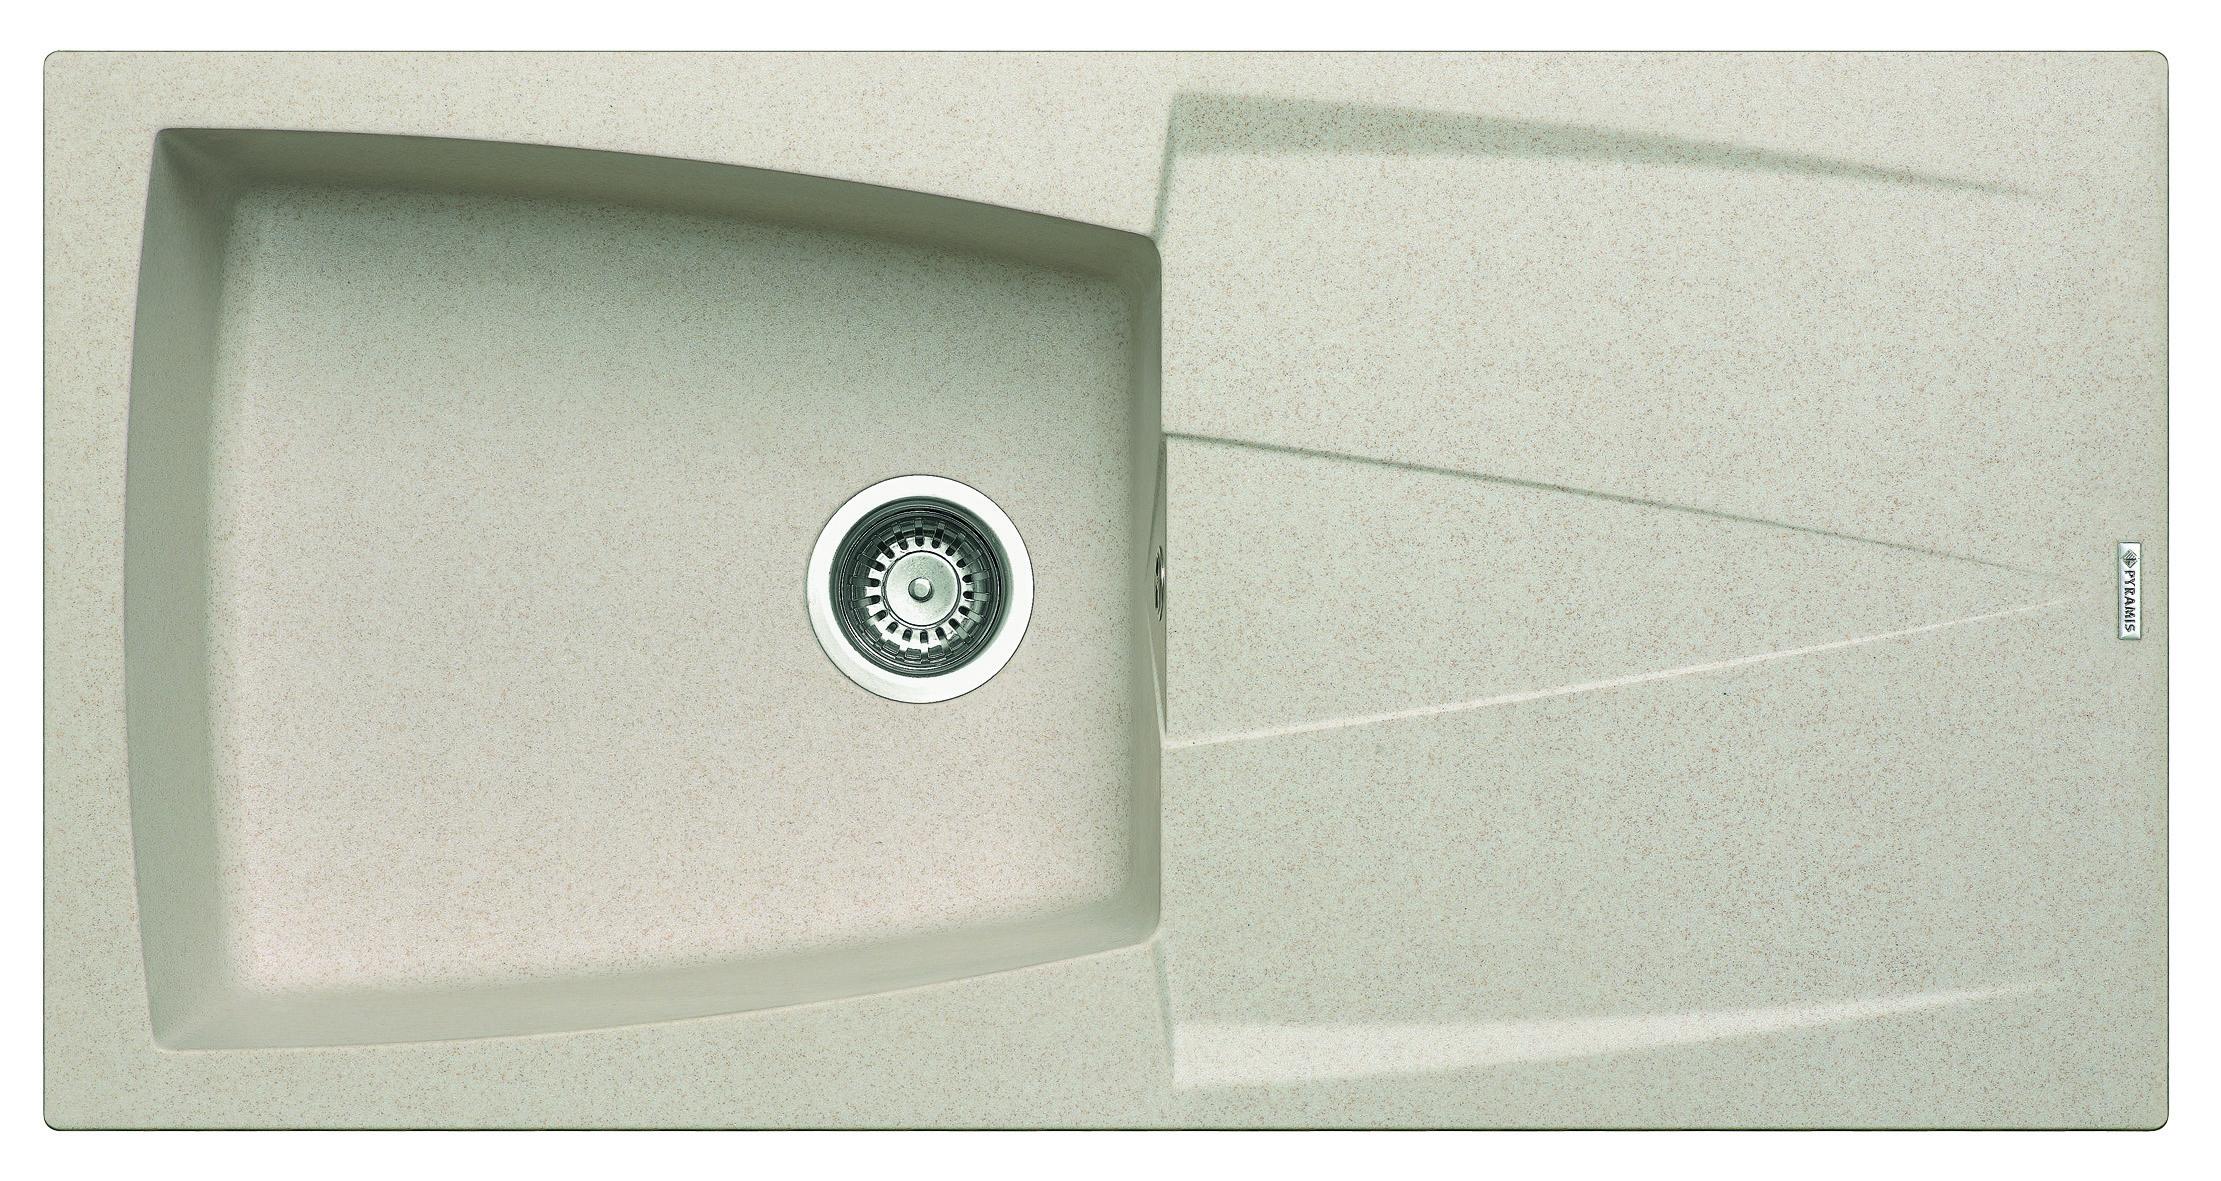 Pyramis24 - Pyragranite-Küchenspüle Caldera (100x51)